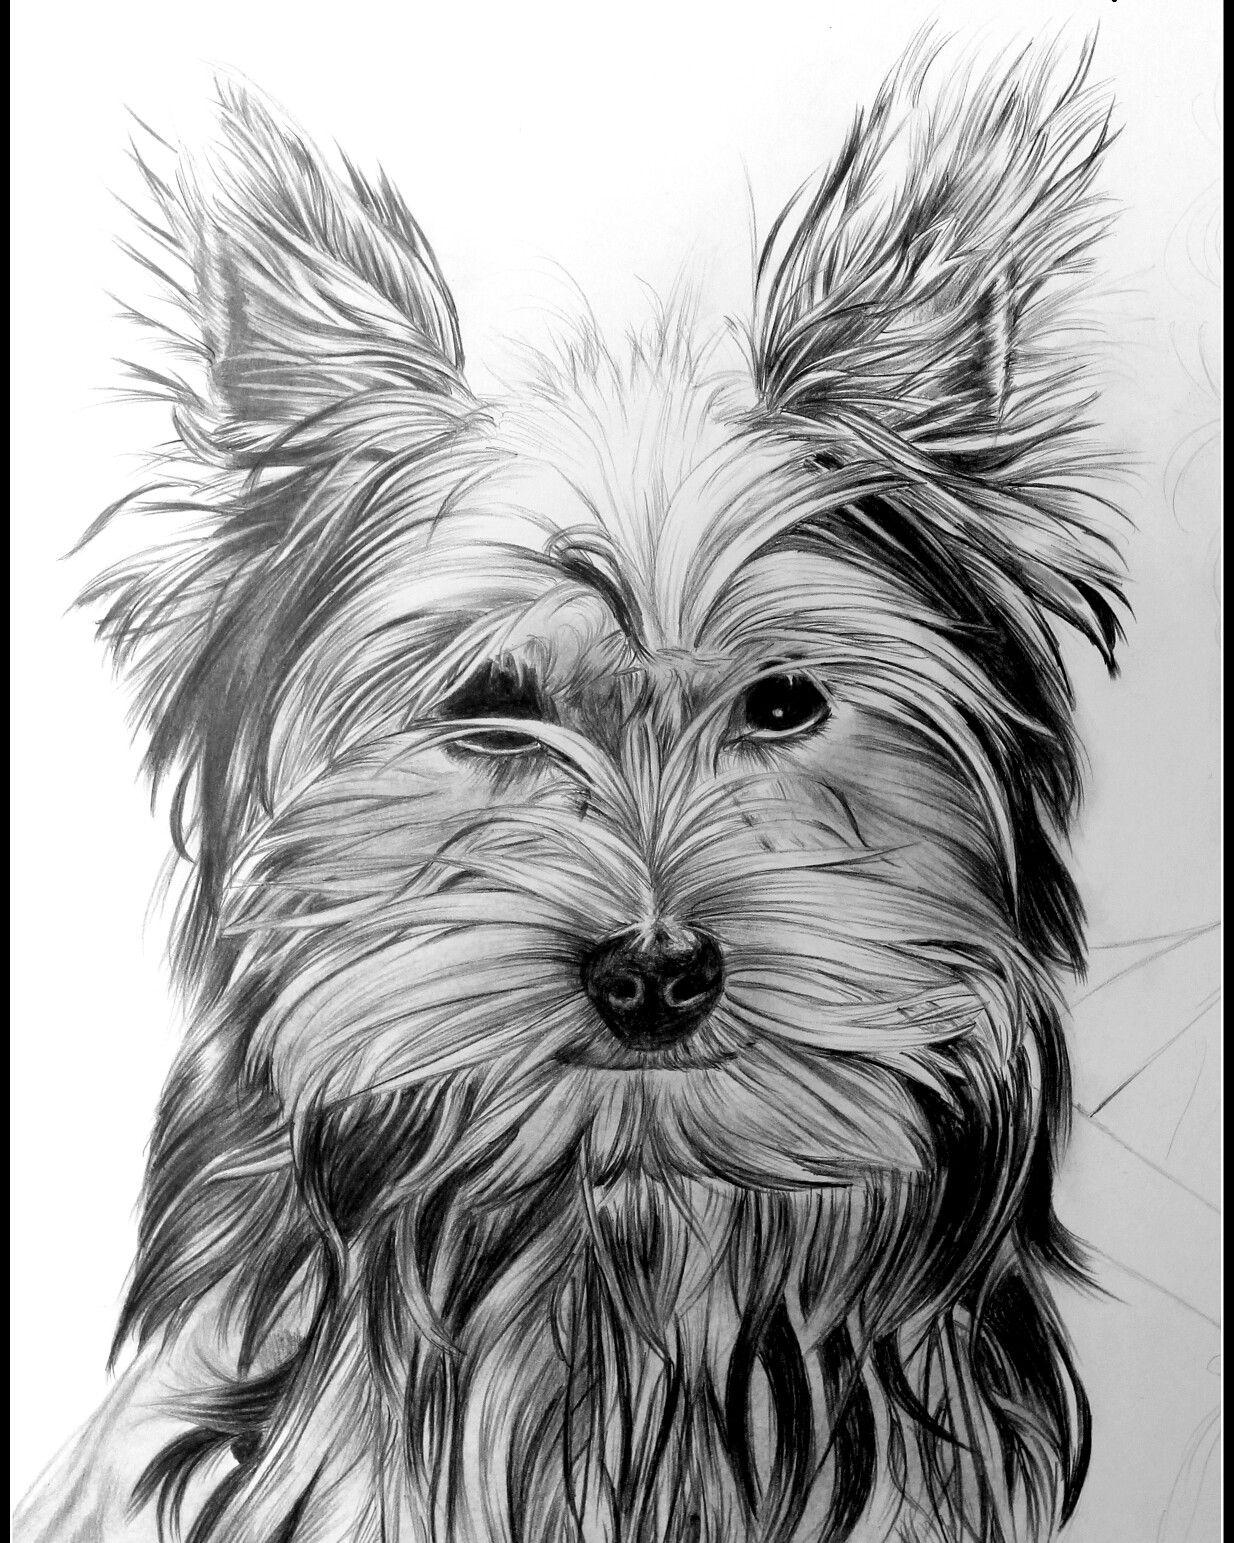 Dessin r aliste animaux chien au crayon portraitiste - Animal dessin ...